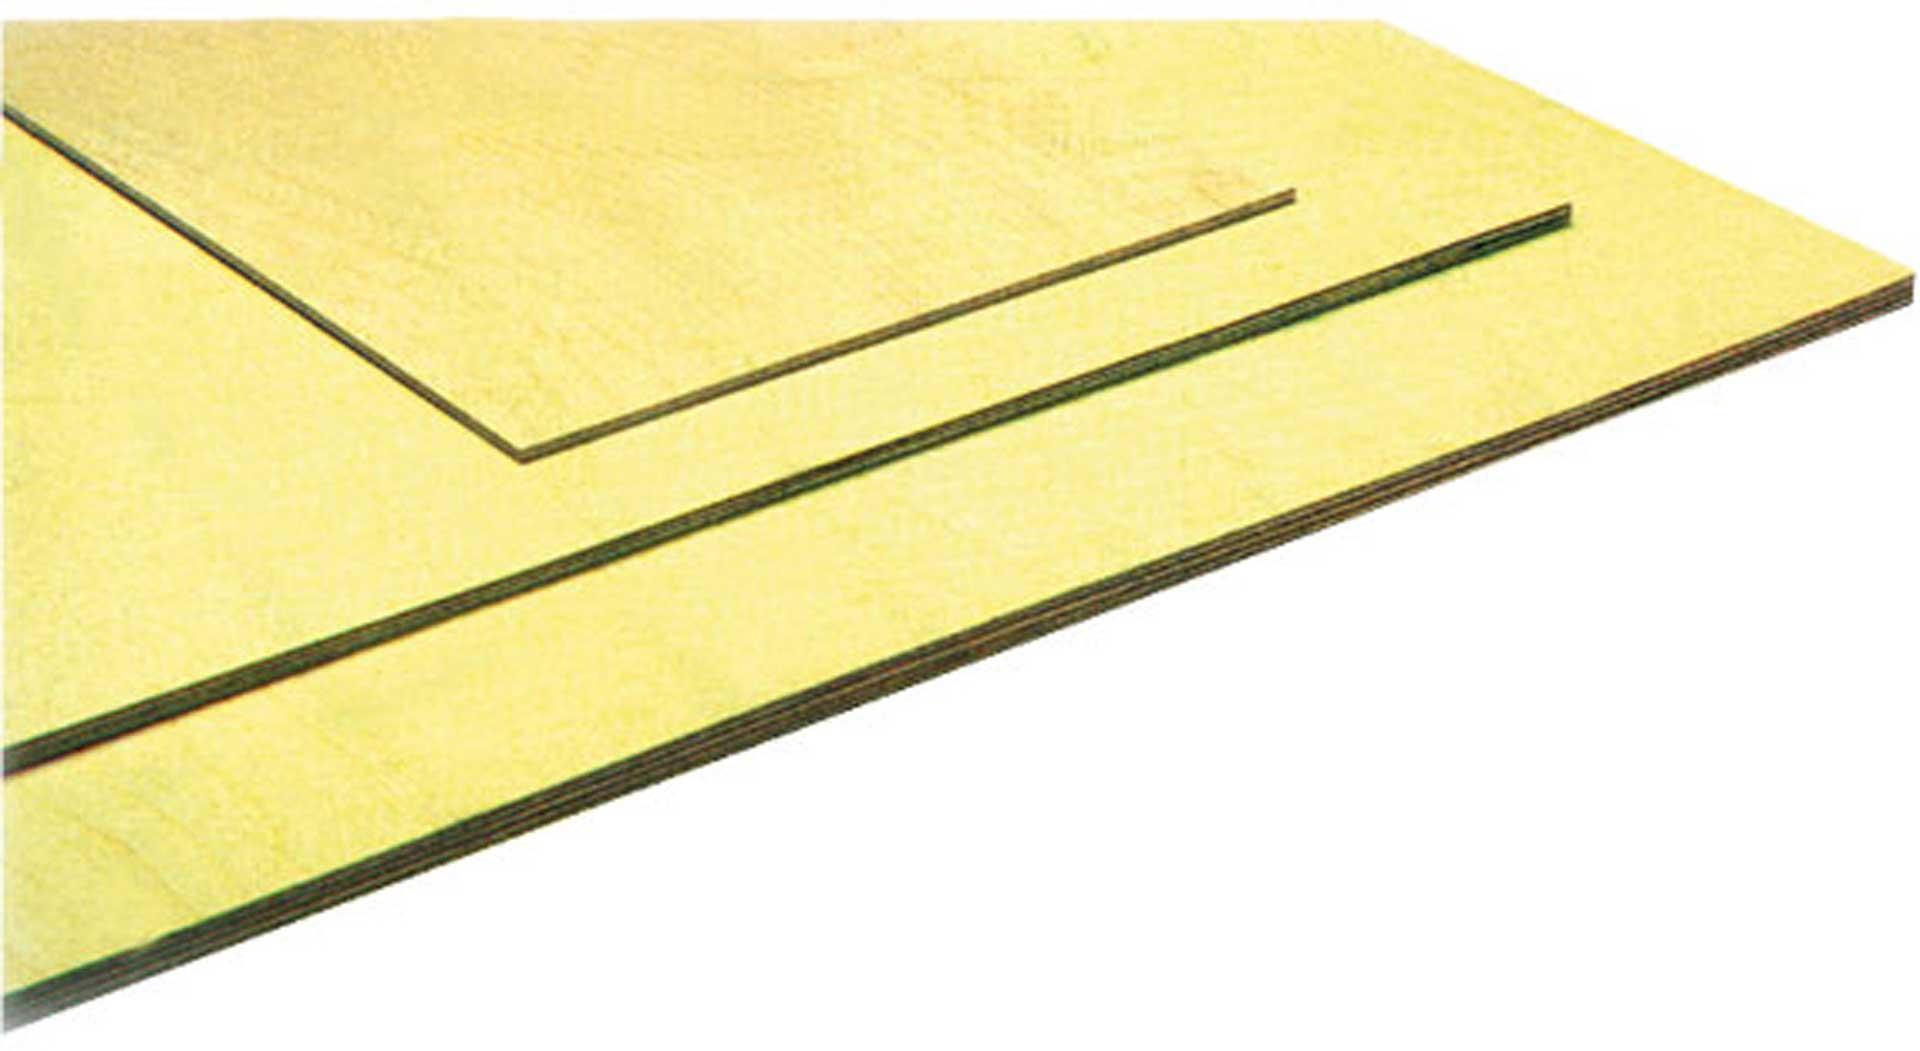 MODELLBAU LINDINGER BIRCH-SPERRY 0,4/300/1000MM